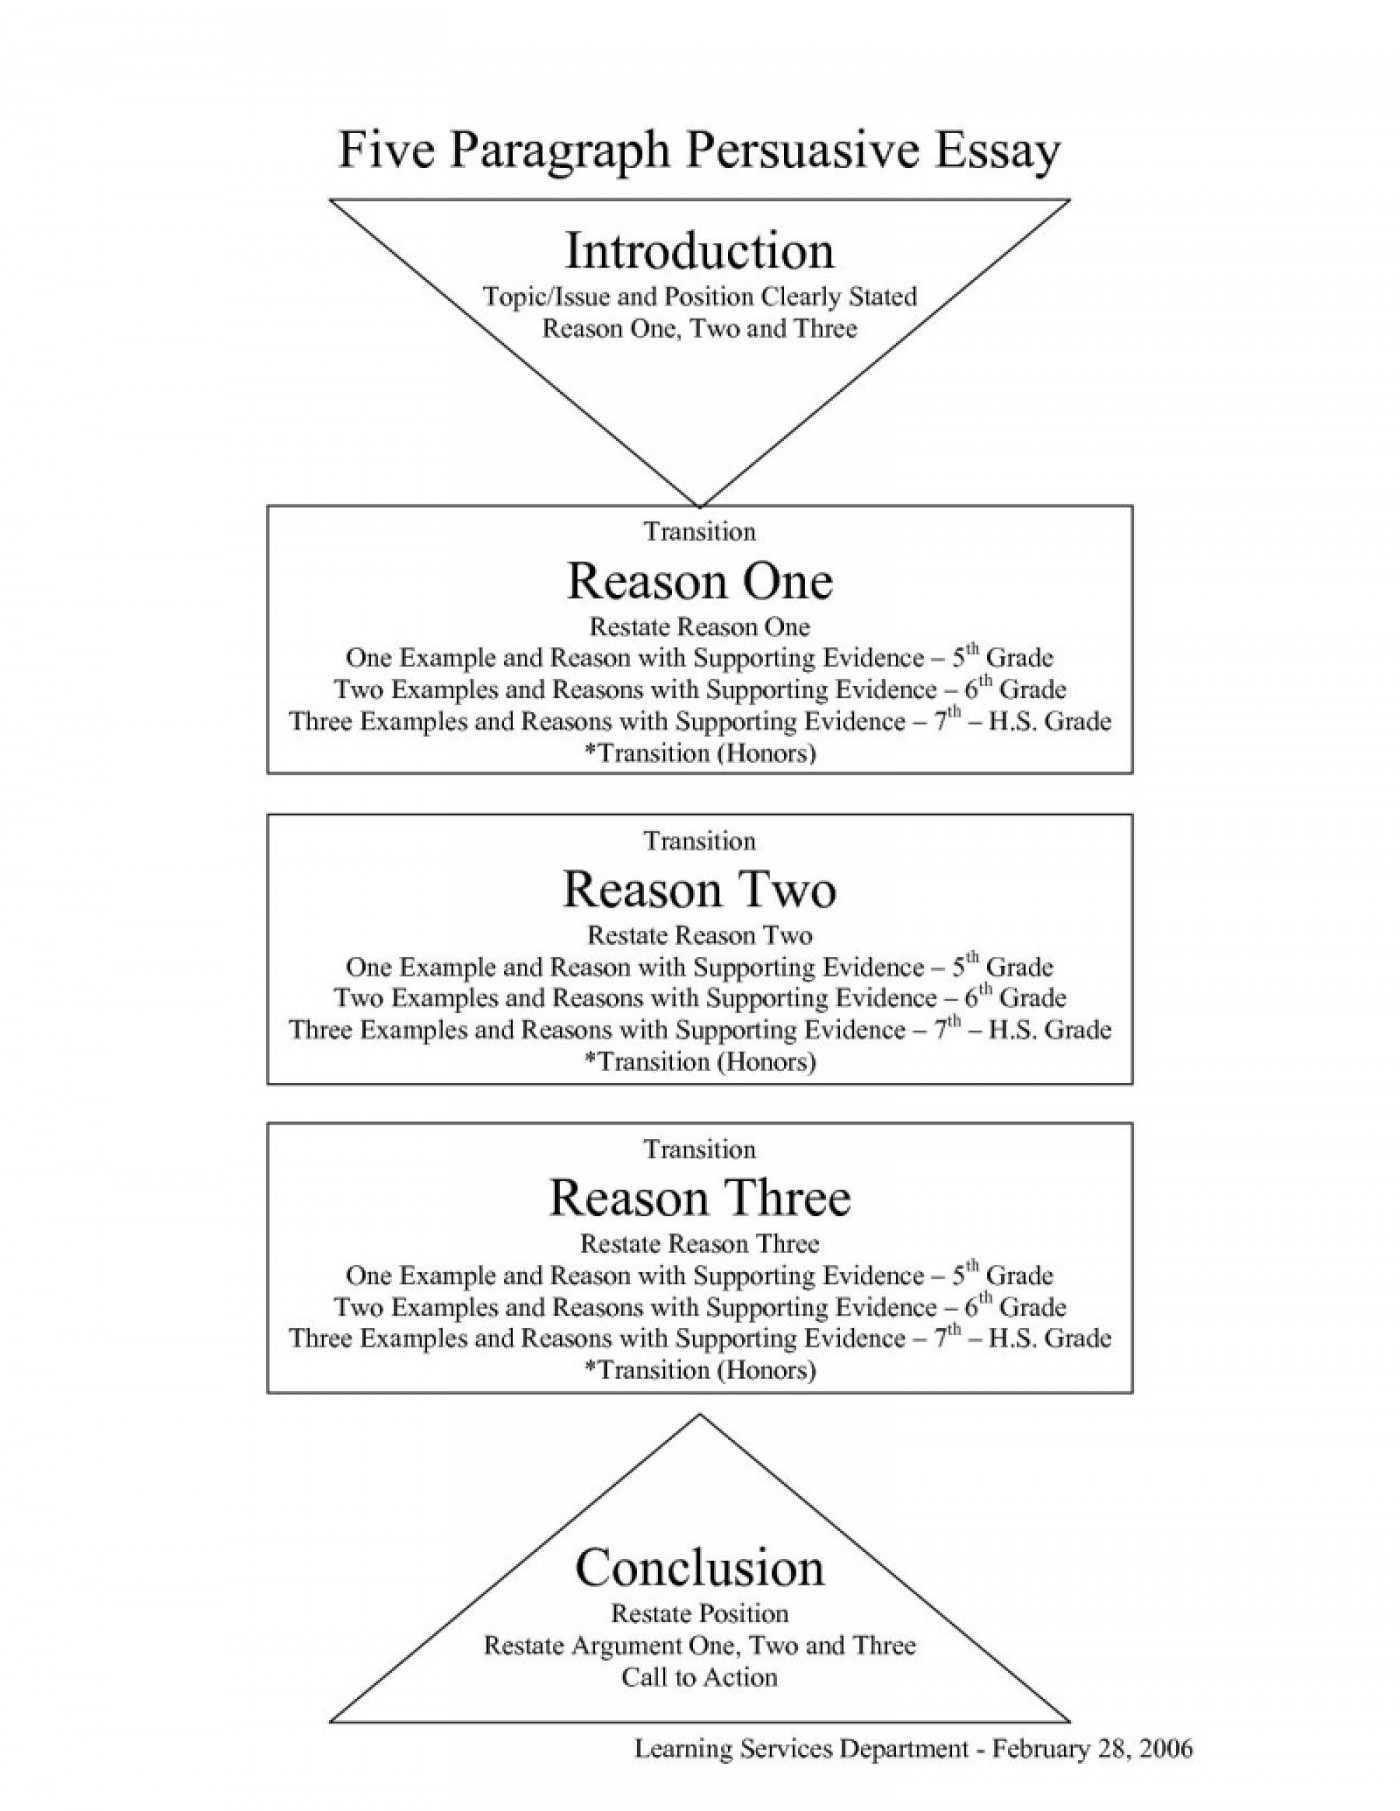 011 Essay Example Conclusion Transitions For Argumentative Essays Poemsrom Co Paragraph Structure Outline Persuasive Intro Good Argument Outstanding Pdf Prezi Nat 5 1400